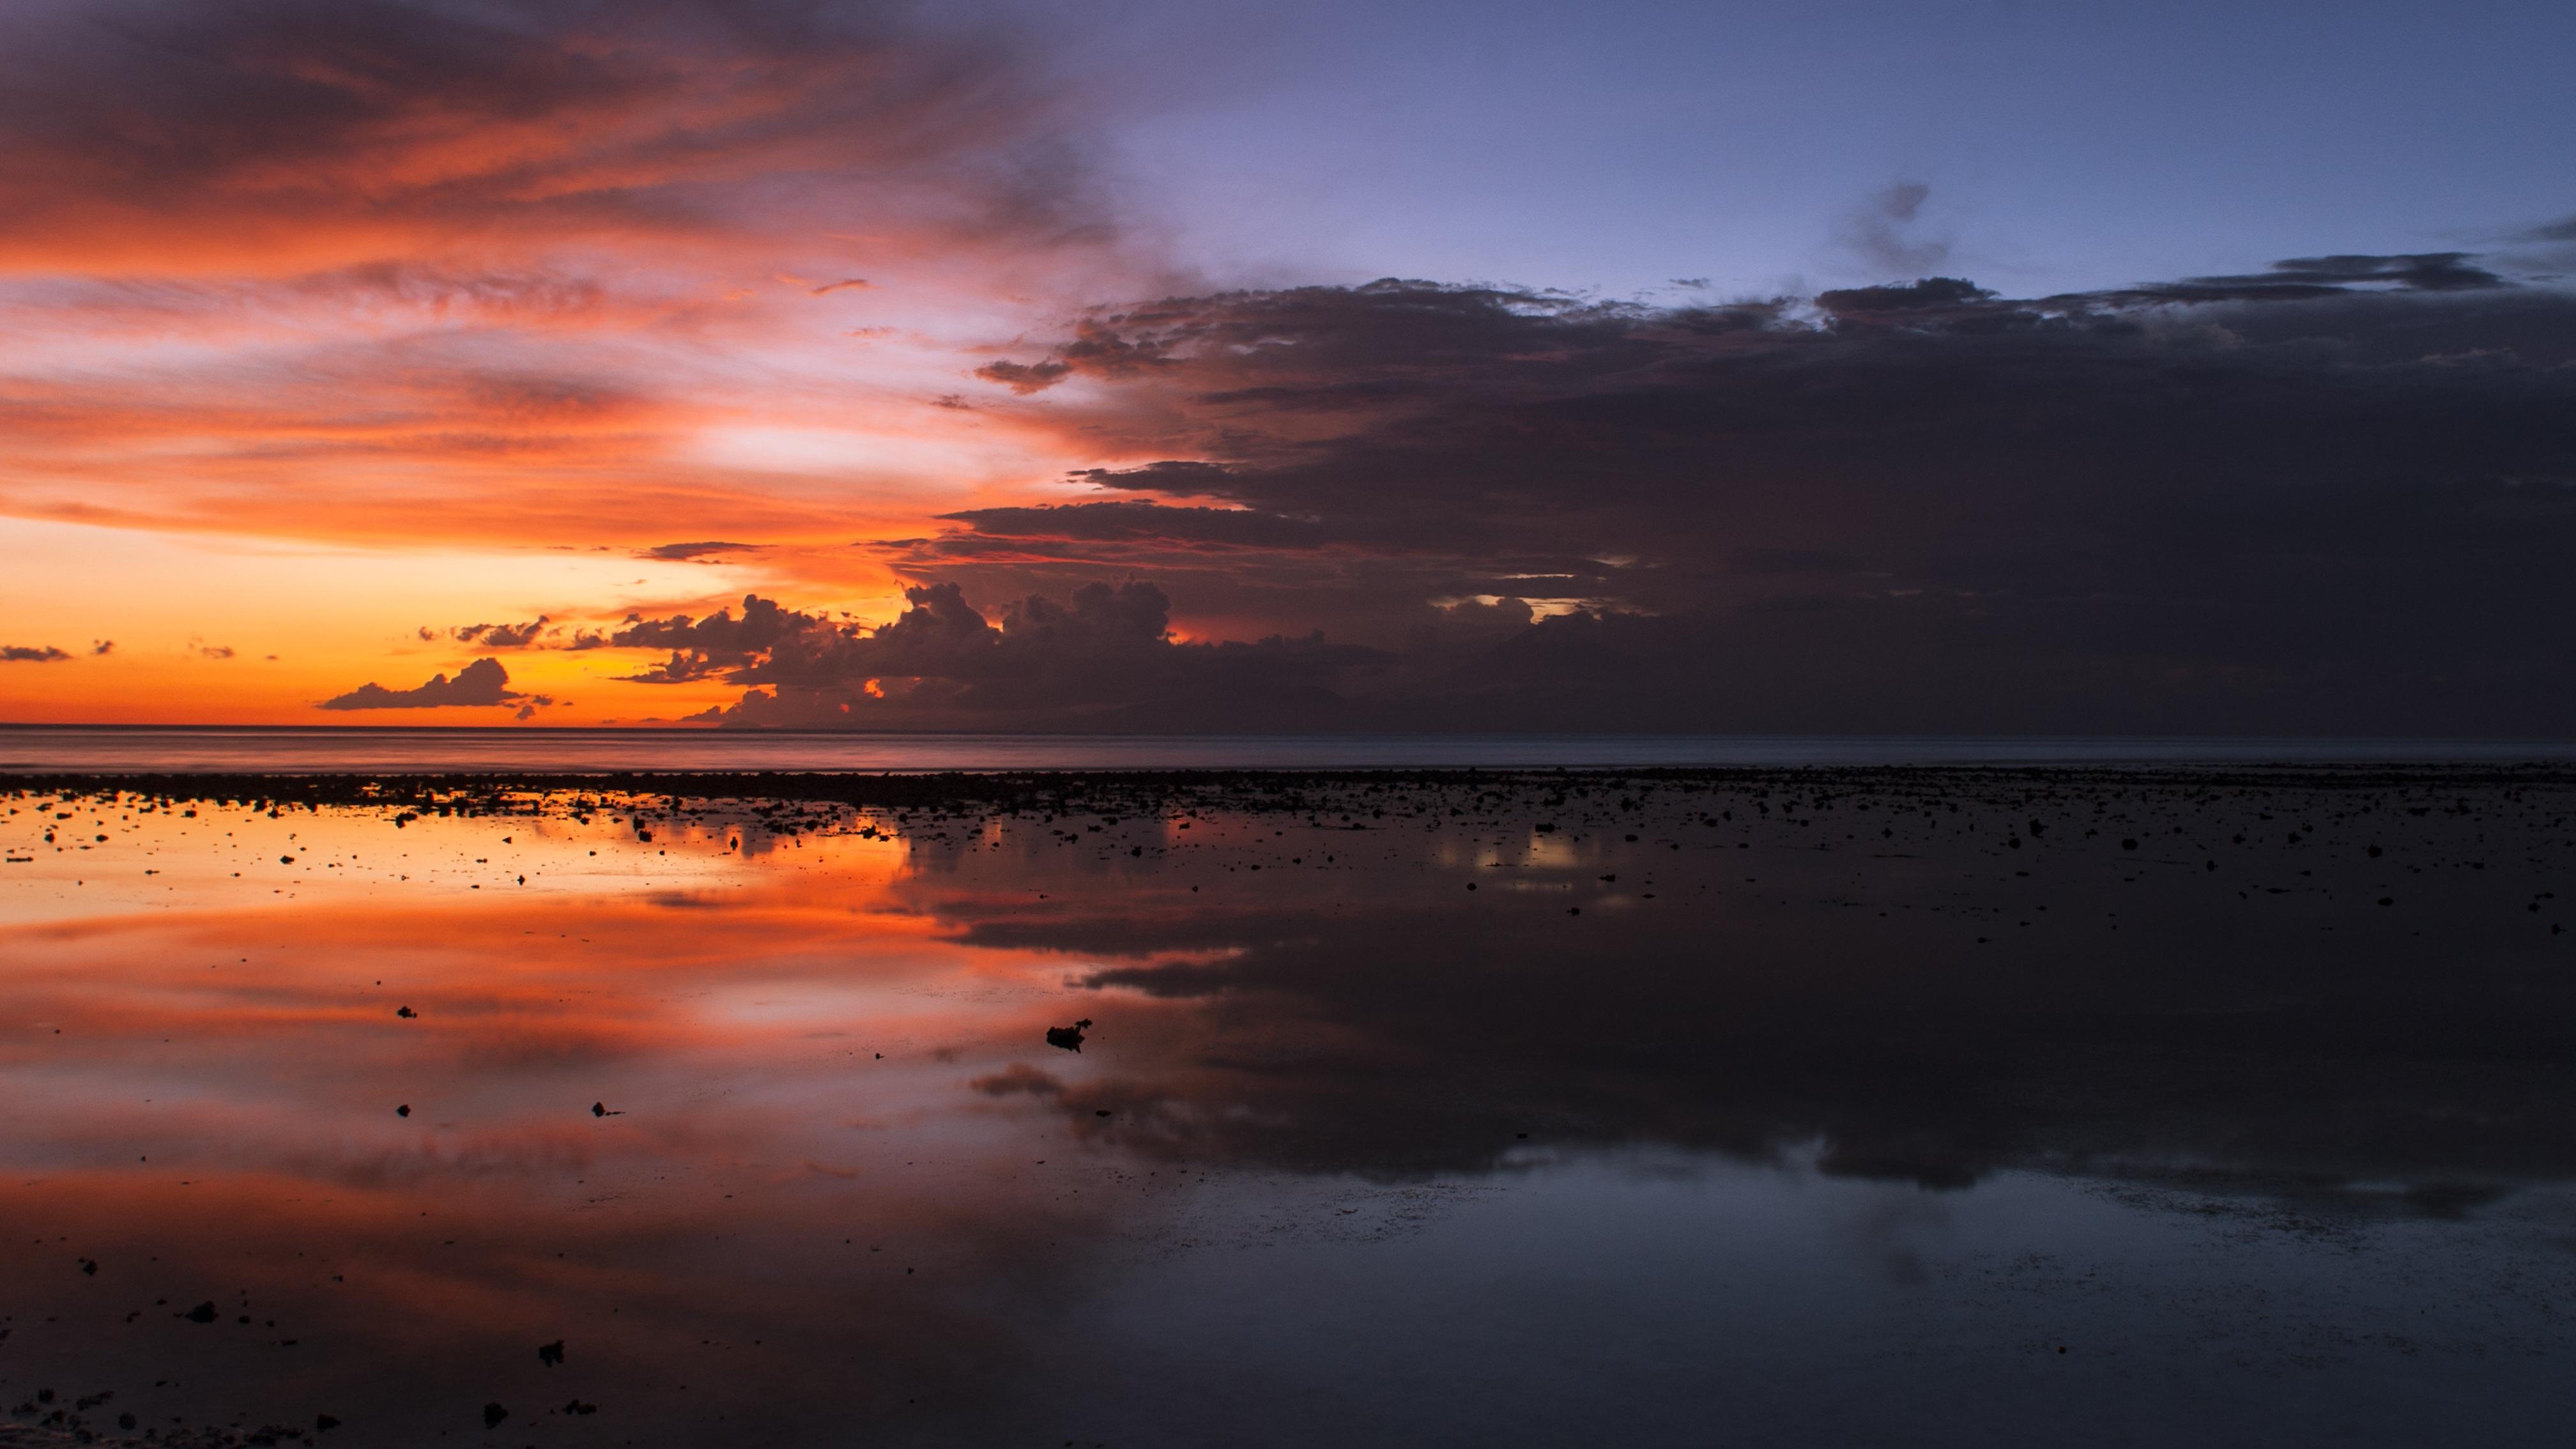 Gambar Pemandangan Lautan Horison Awan Langit Matahari Terbit